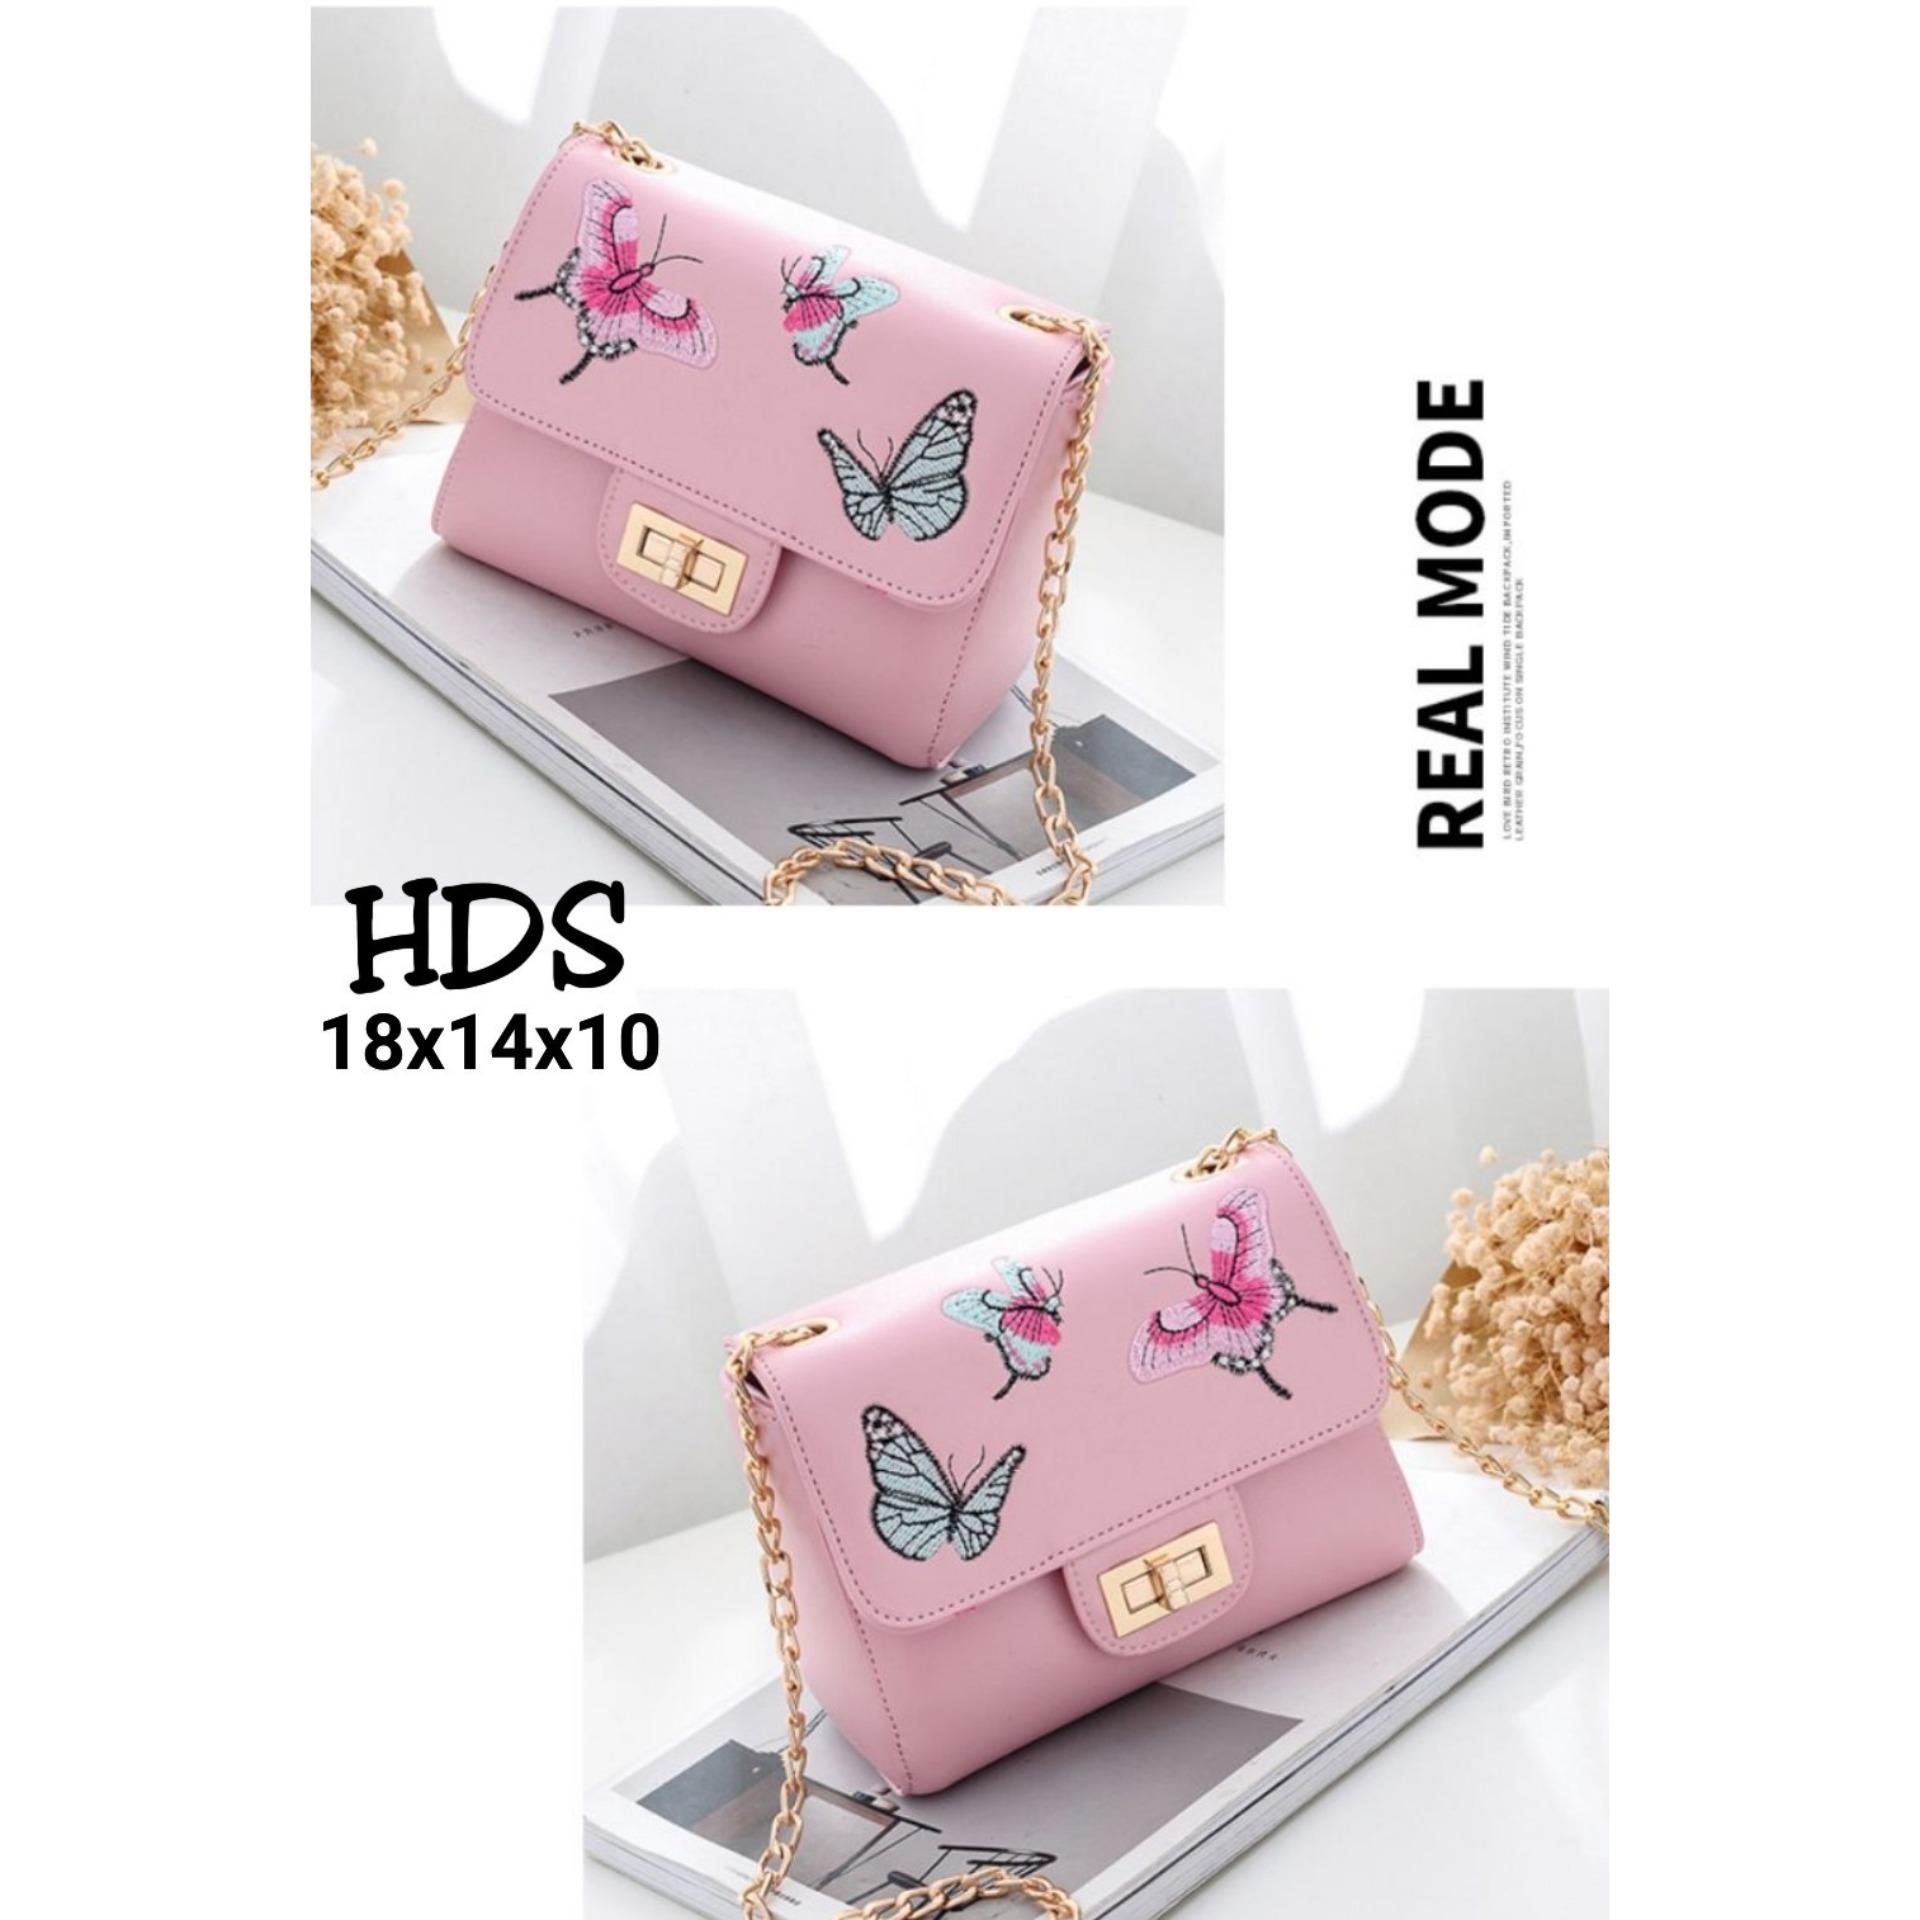 Fitur Sling Bag Korean Style Cookie Tas Selempang Pink Wanita Butterfly Locker